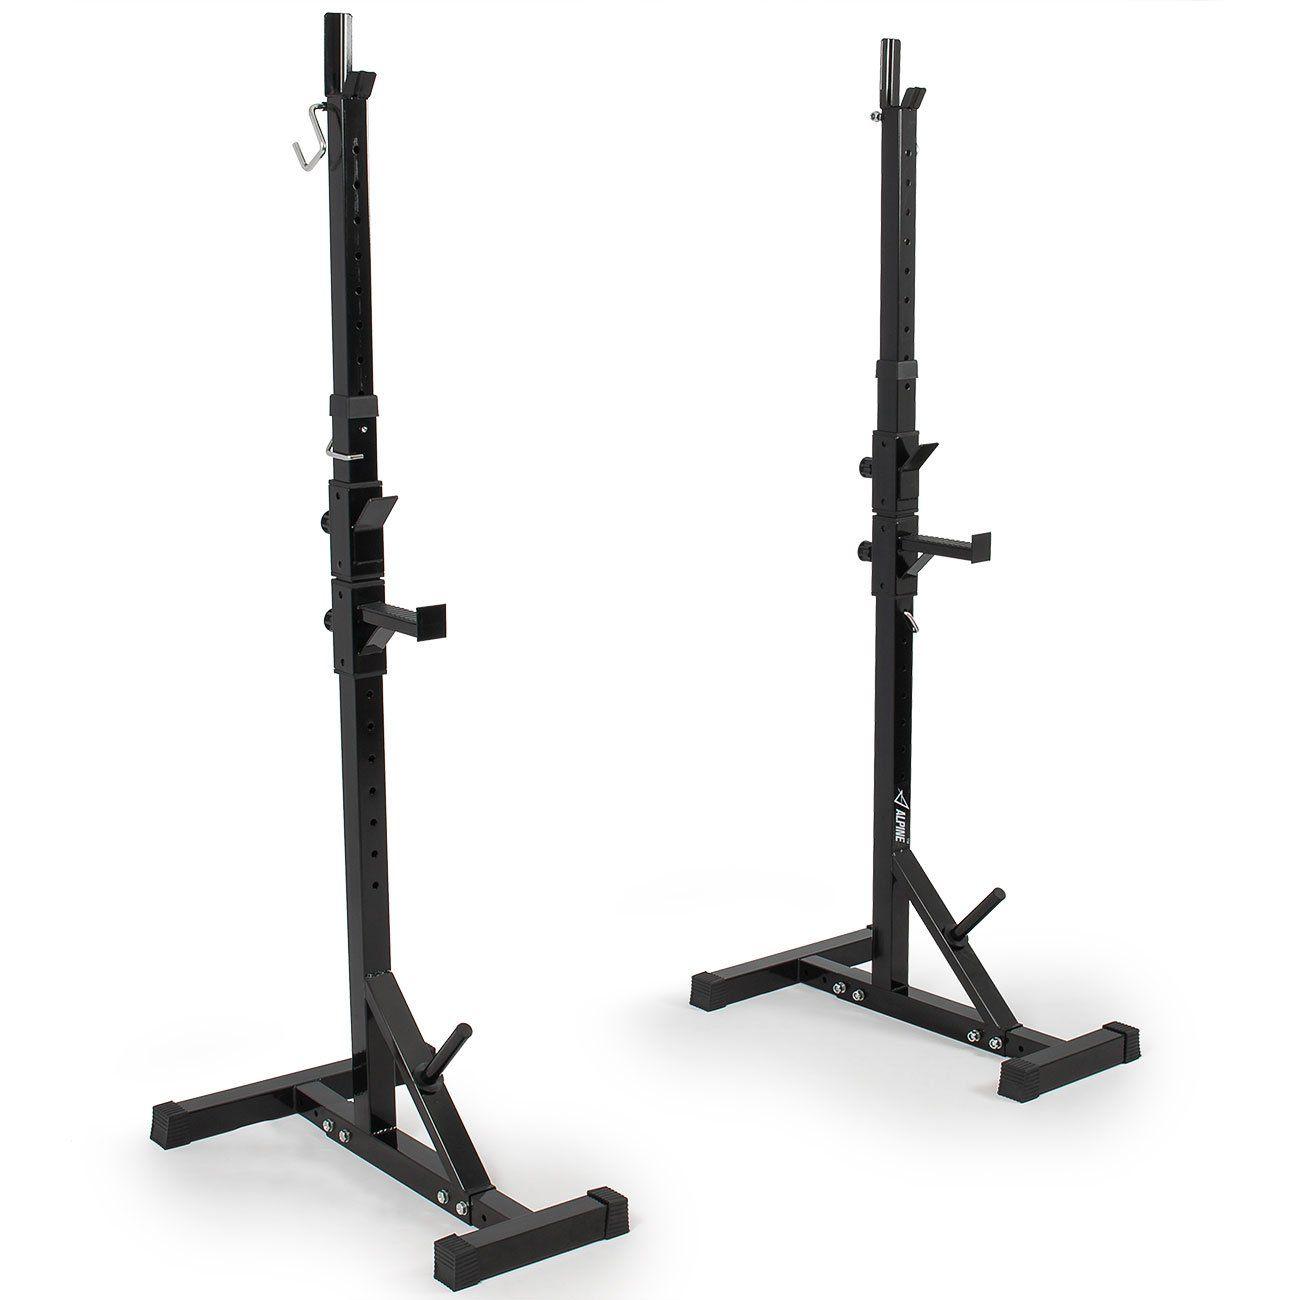 Akonza pair of adjustable standard solid steel power squat